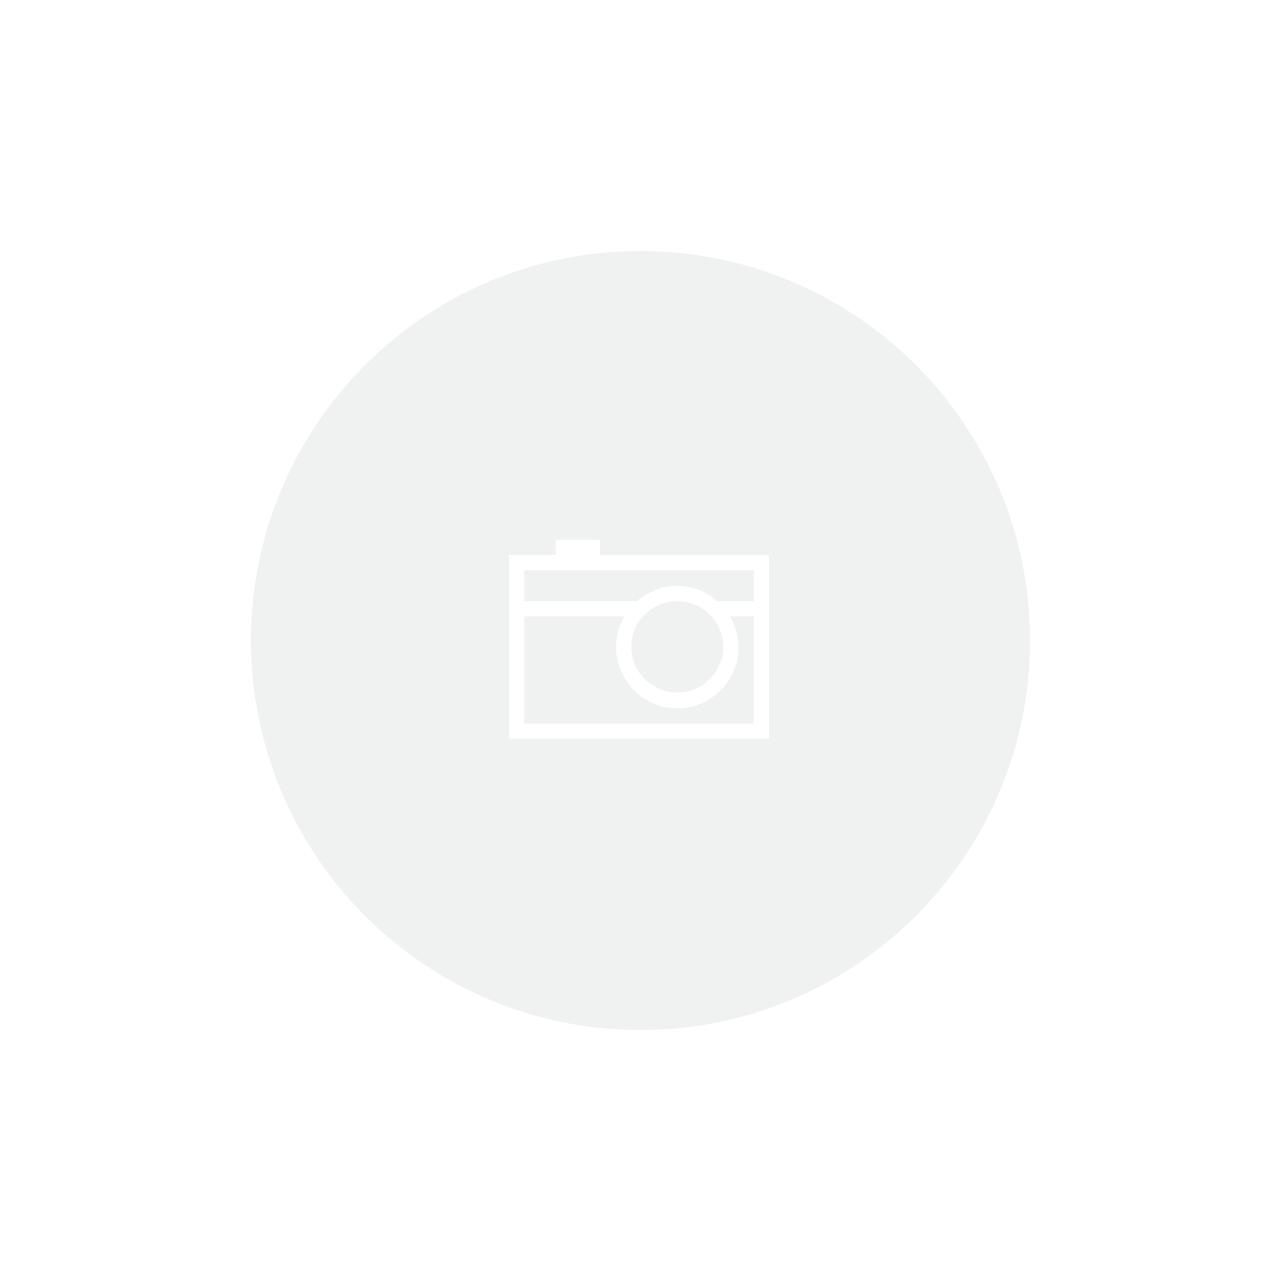 Fôrma para Bolo Antiaderente 20 cm Brasil Tramontina